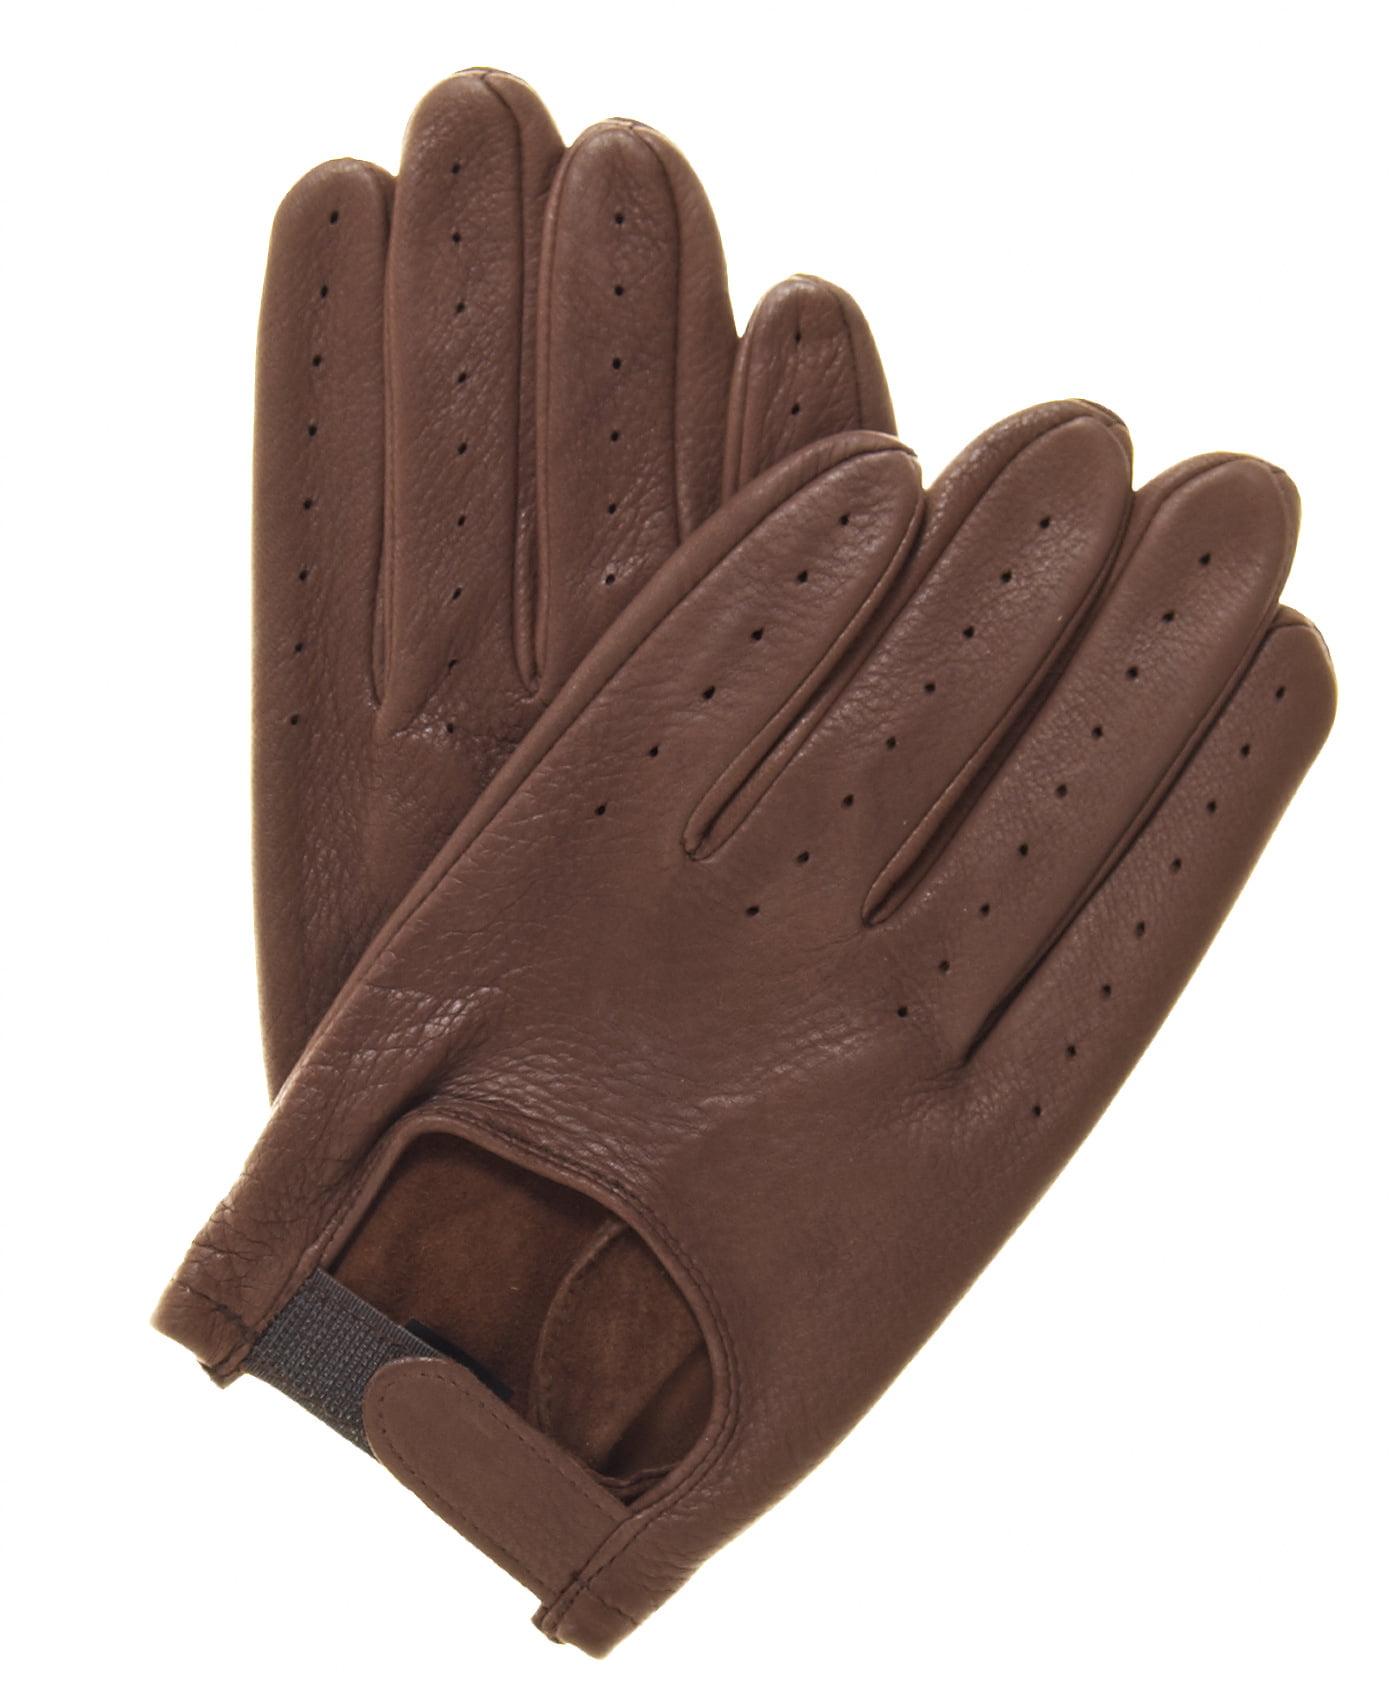 Driving gloves at walmart - Pratt And Hart Men S Deerskin Leather Driving Gloves